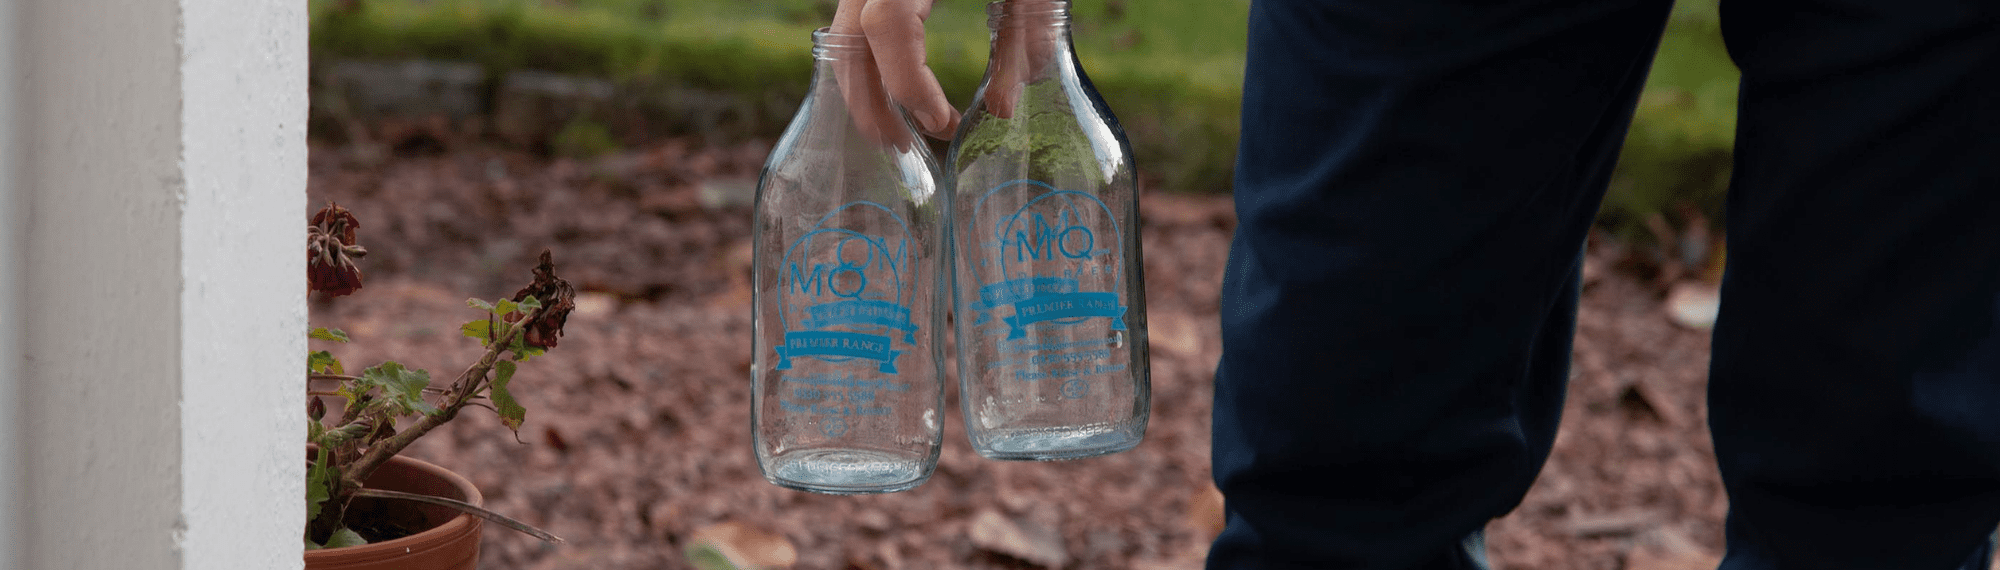 buy milk in glass bottles